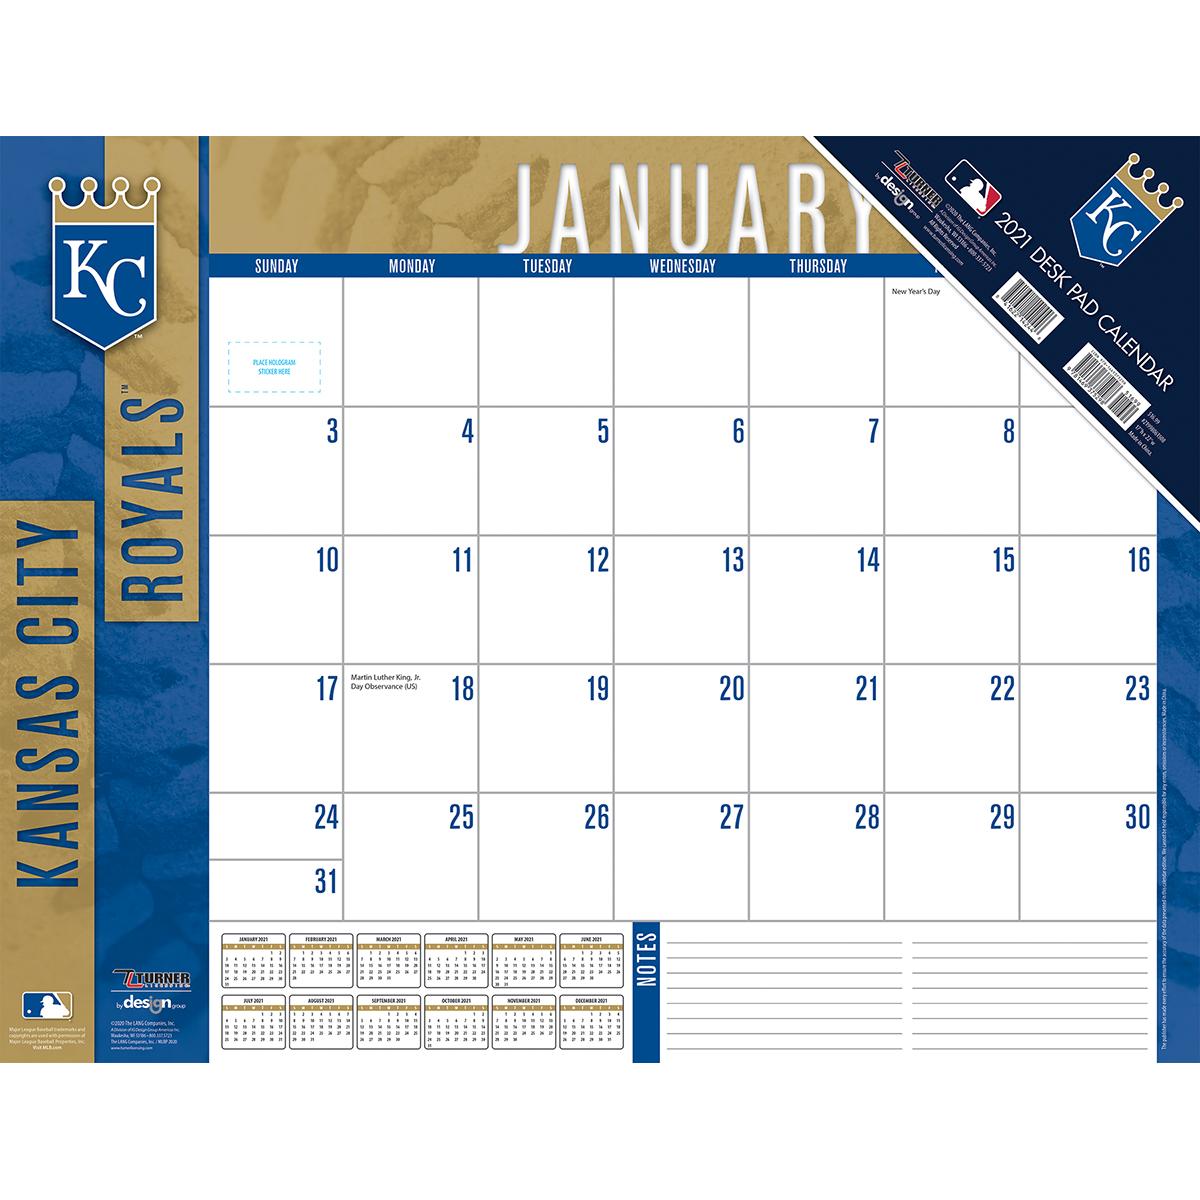 Kansas City Royals 2018 Mlb 22 X 17 Desk Calendar Buy At